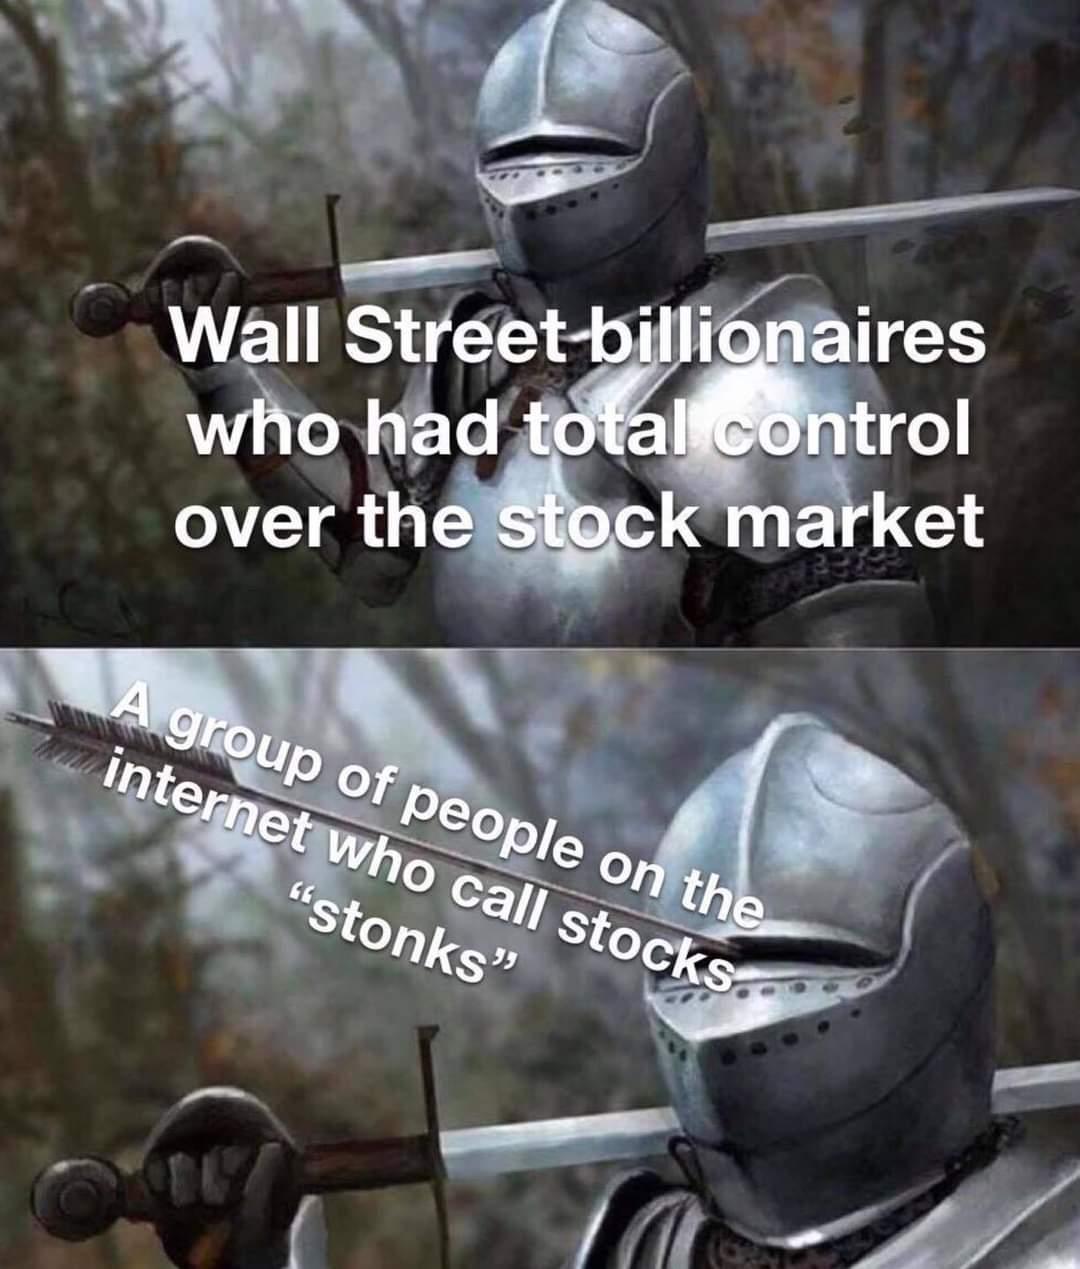 Memes Wall Street billionaires versus reddit